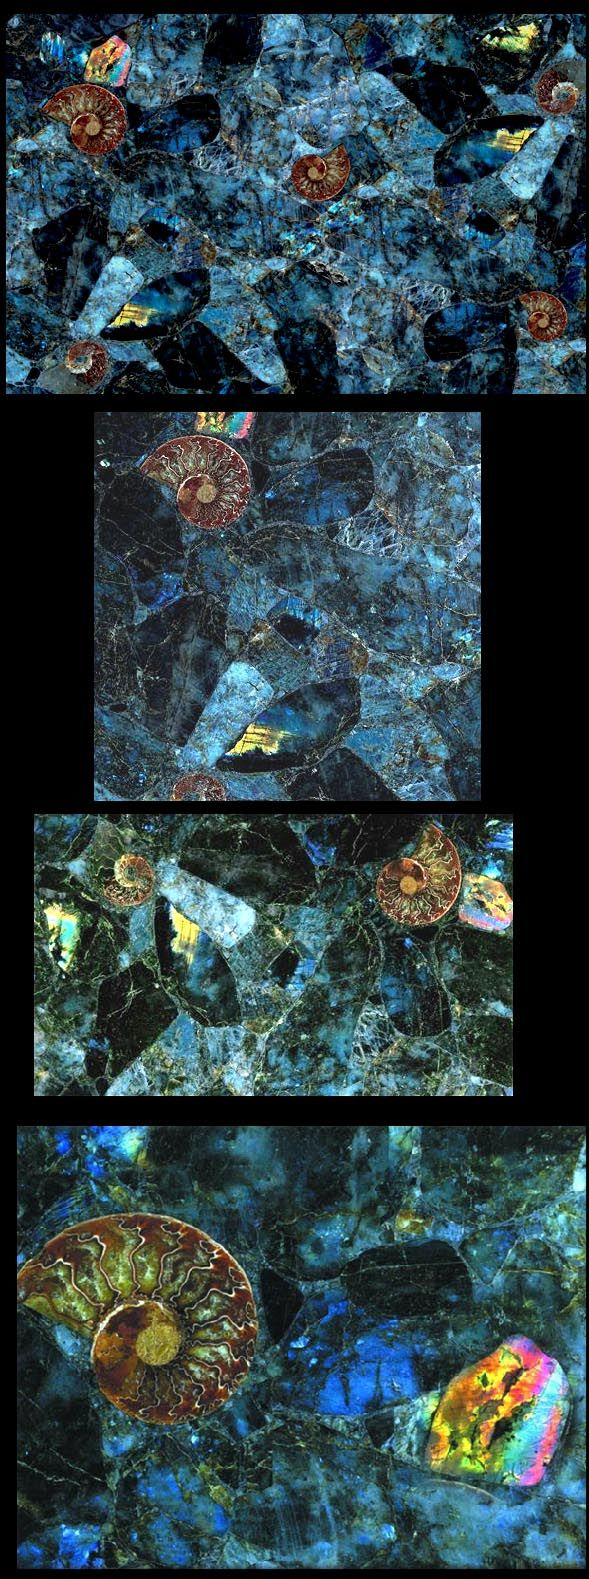 epoxy resin kitchen countertops upgrade ideas labradorite mosaic gemstone slab | architecture/home decor ...